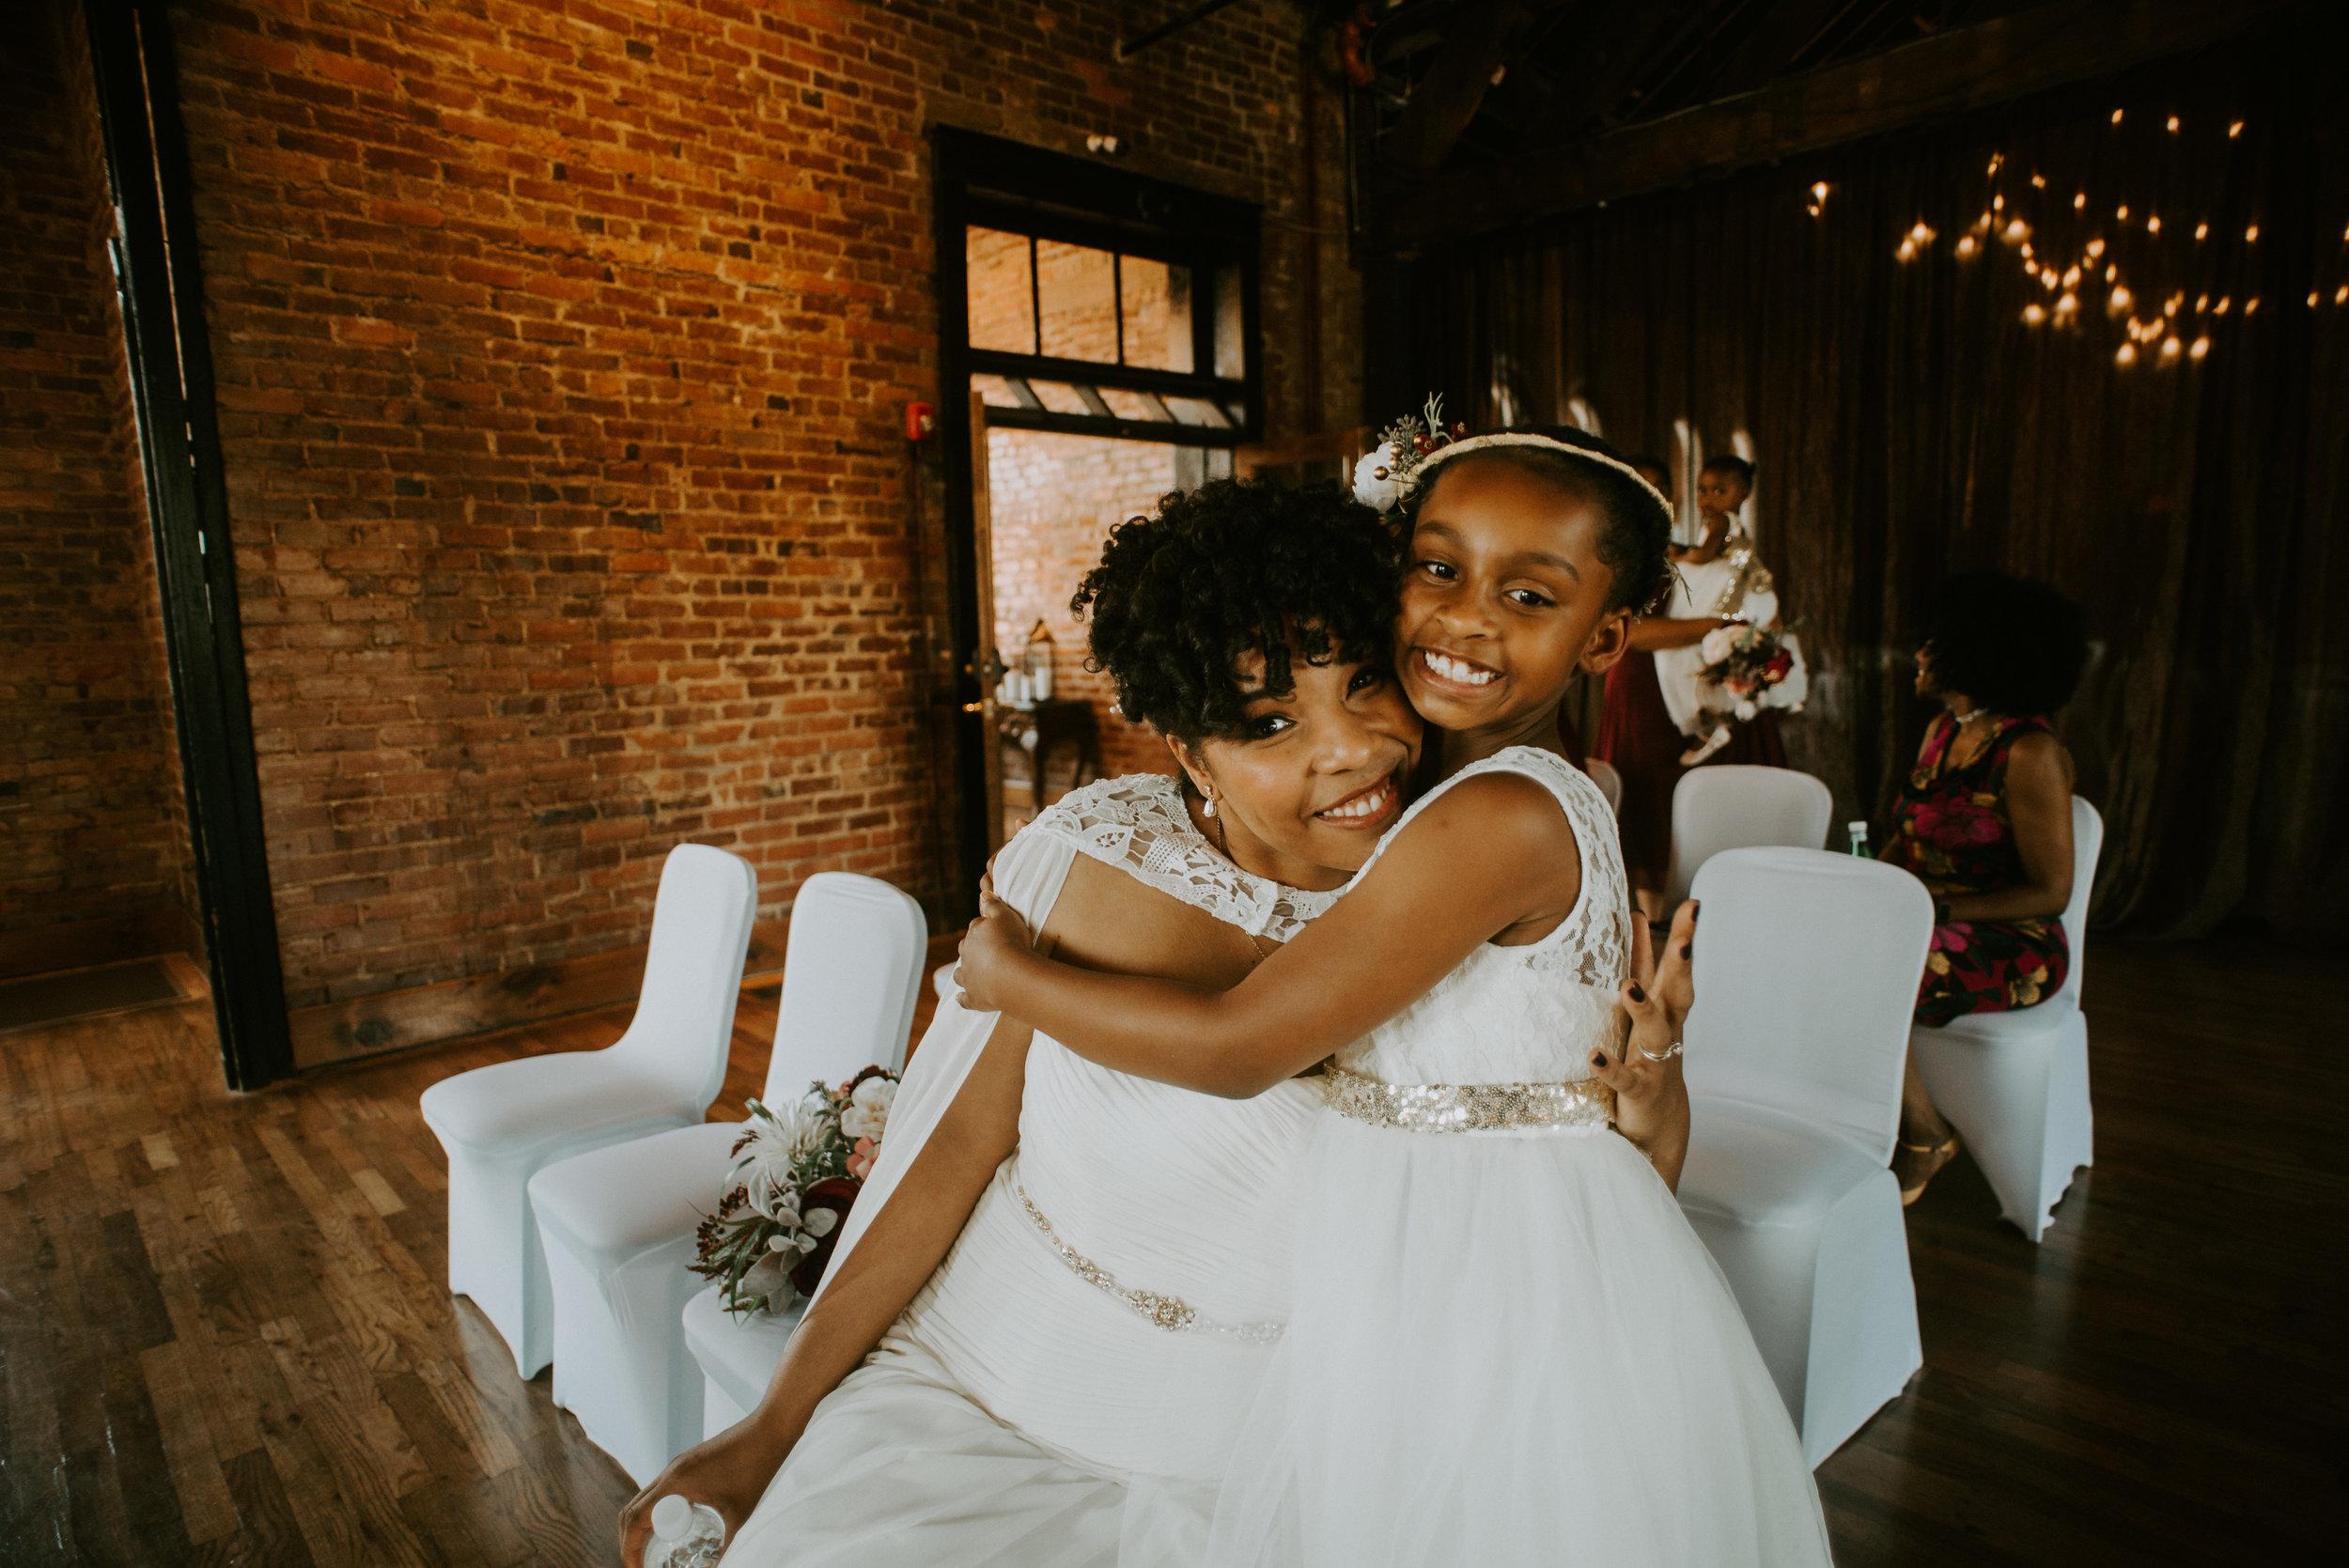 WonderlyCreative_Wedding_6.7.18_Khara&Dwayne_-308.jpg